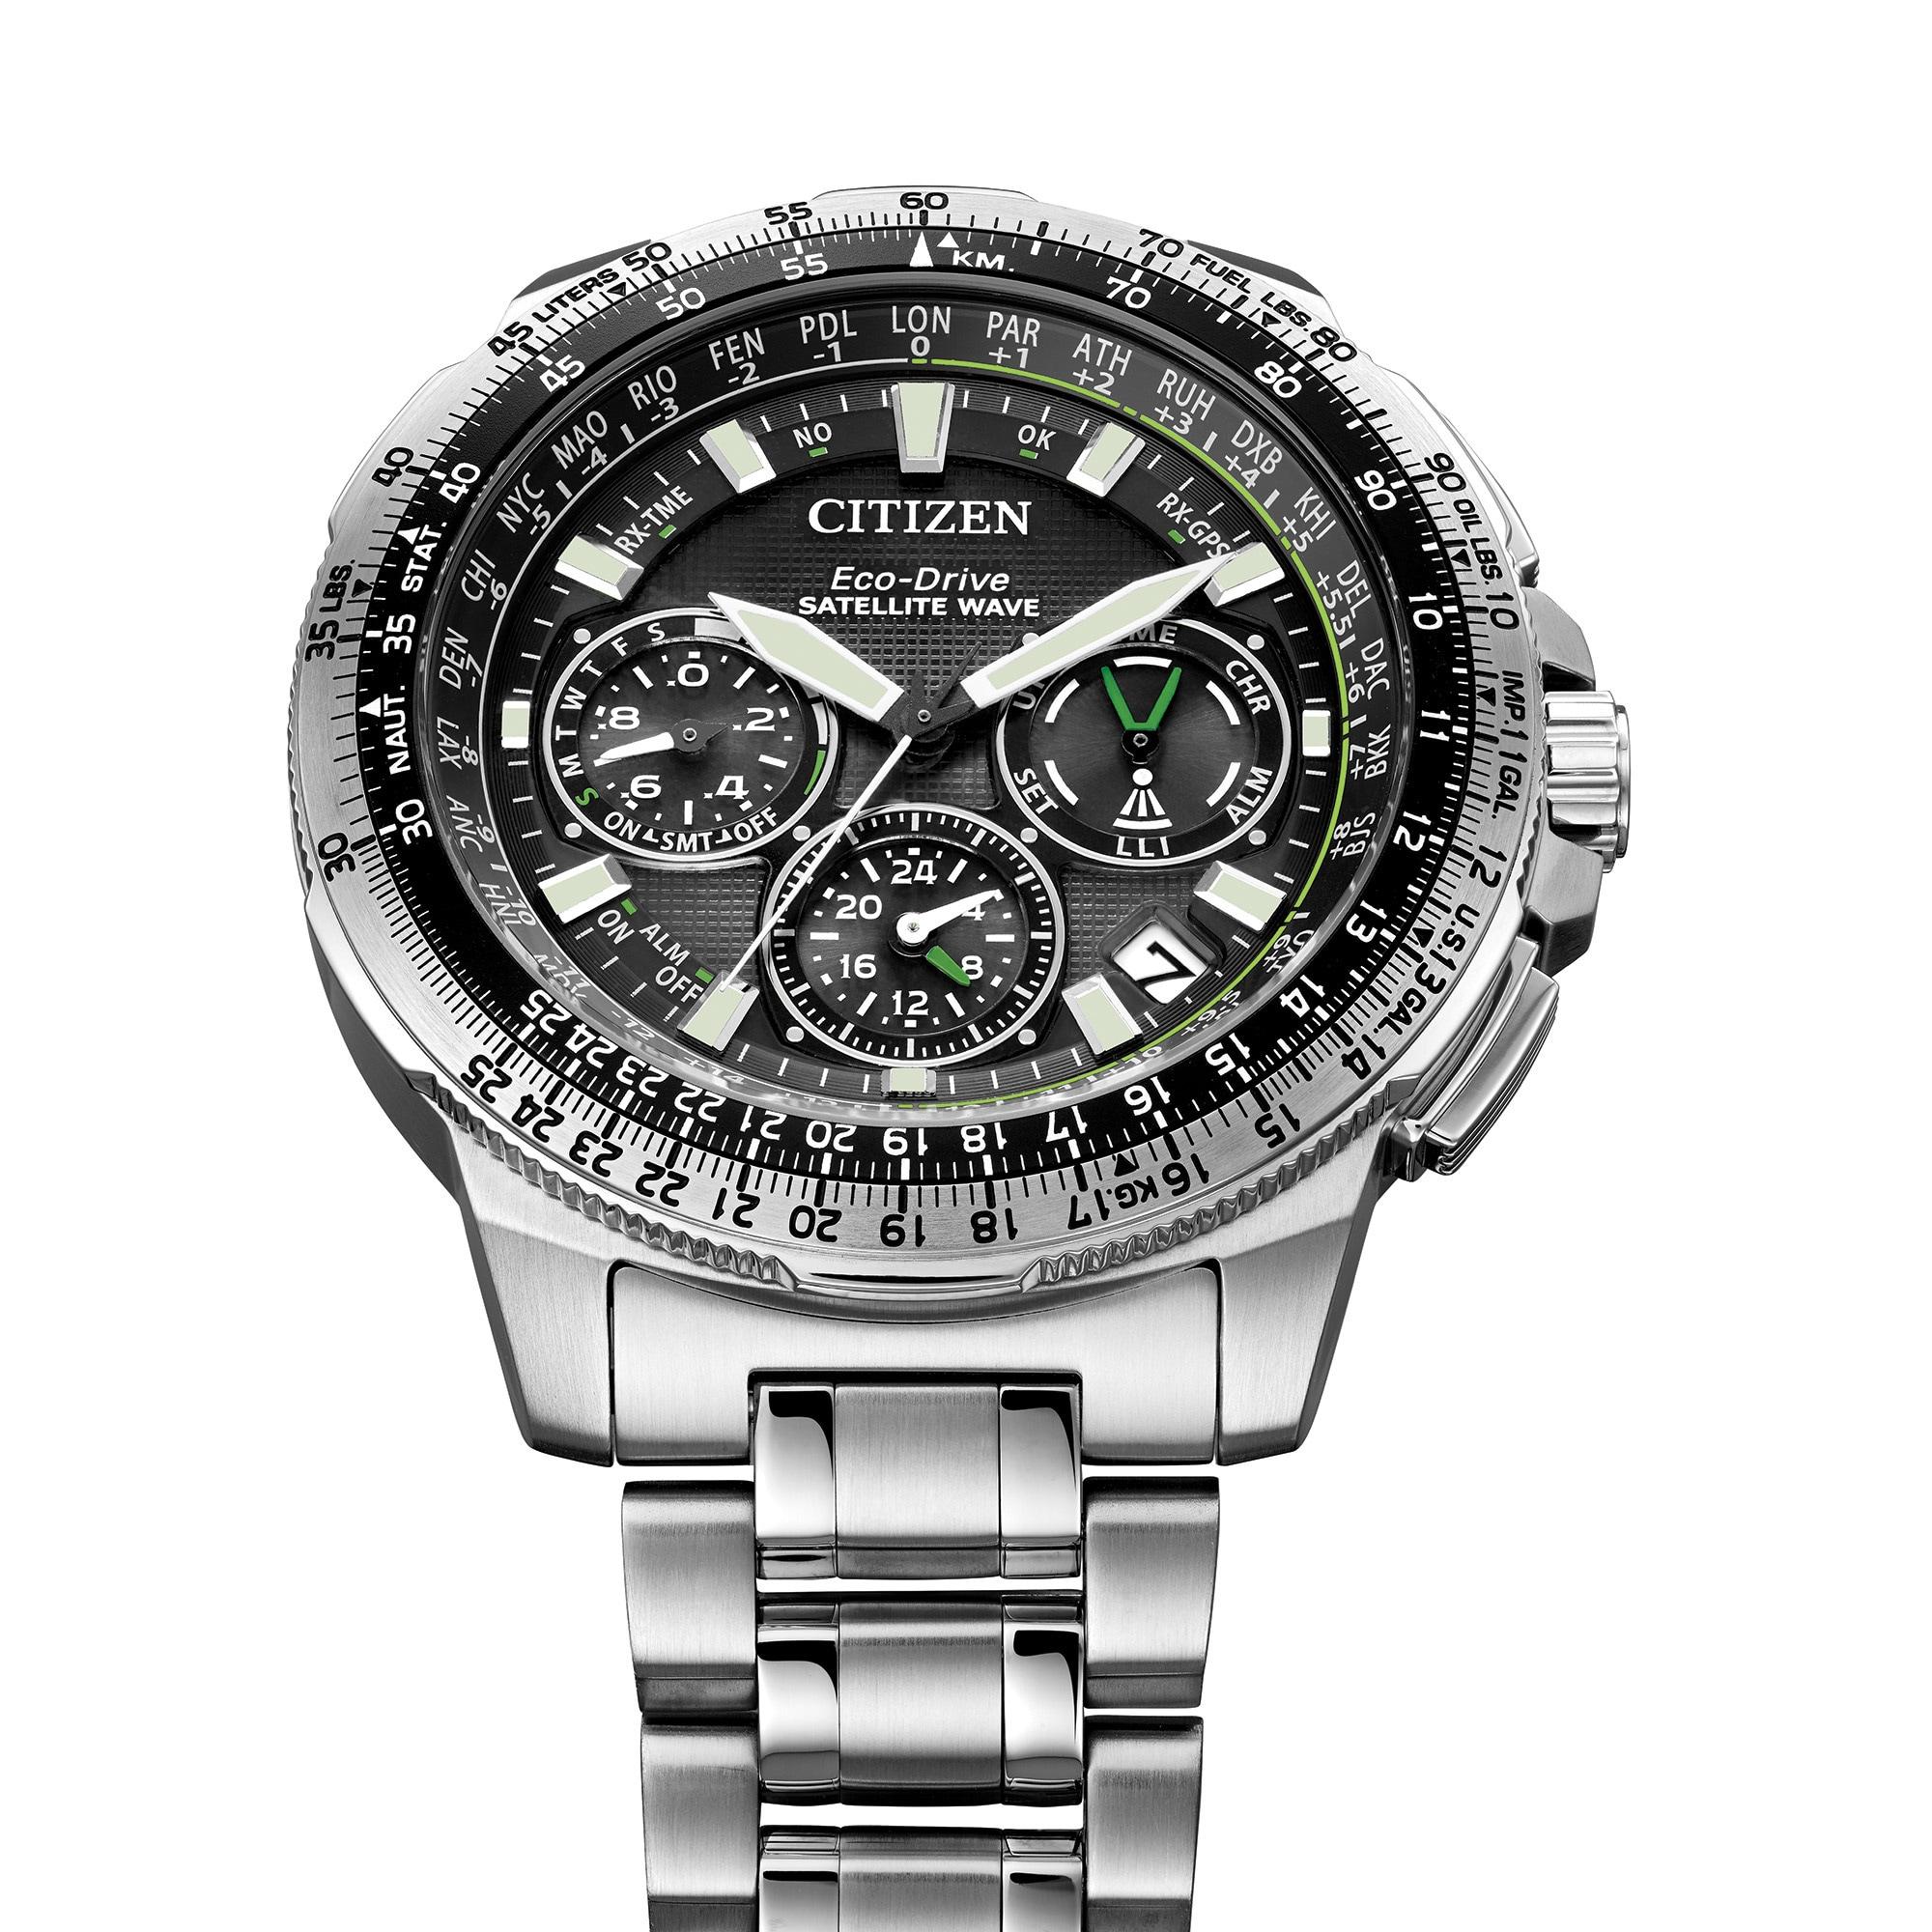 2bba3599e0b Shop Citizen Men s CC9030-51E Promaster Navihawk GPS Stainless Steel Watch  - Free Shipping Today - Overstock - 11551674